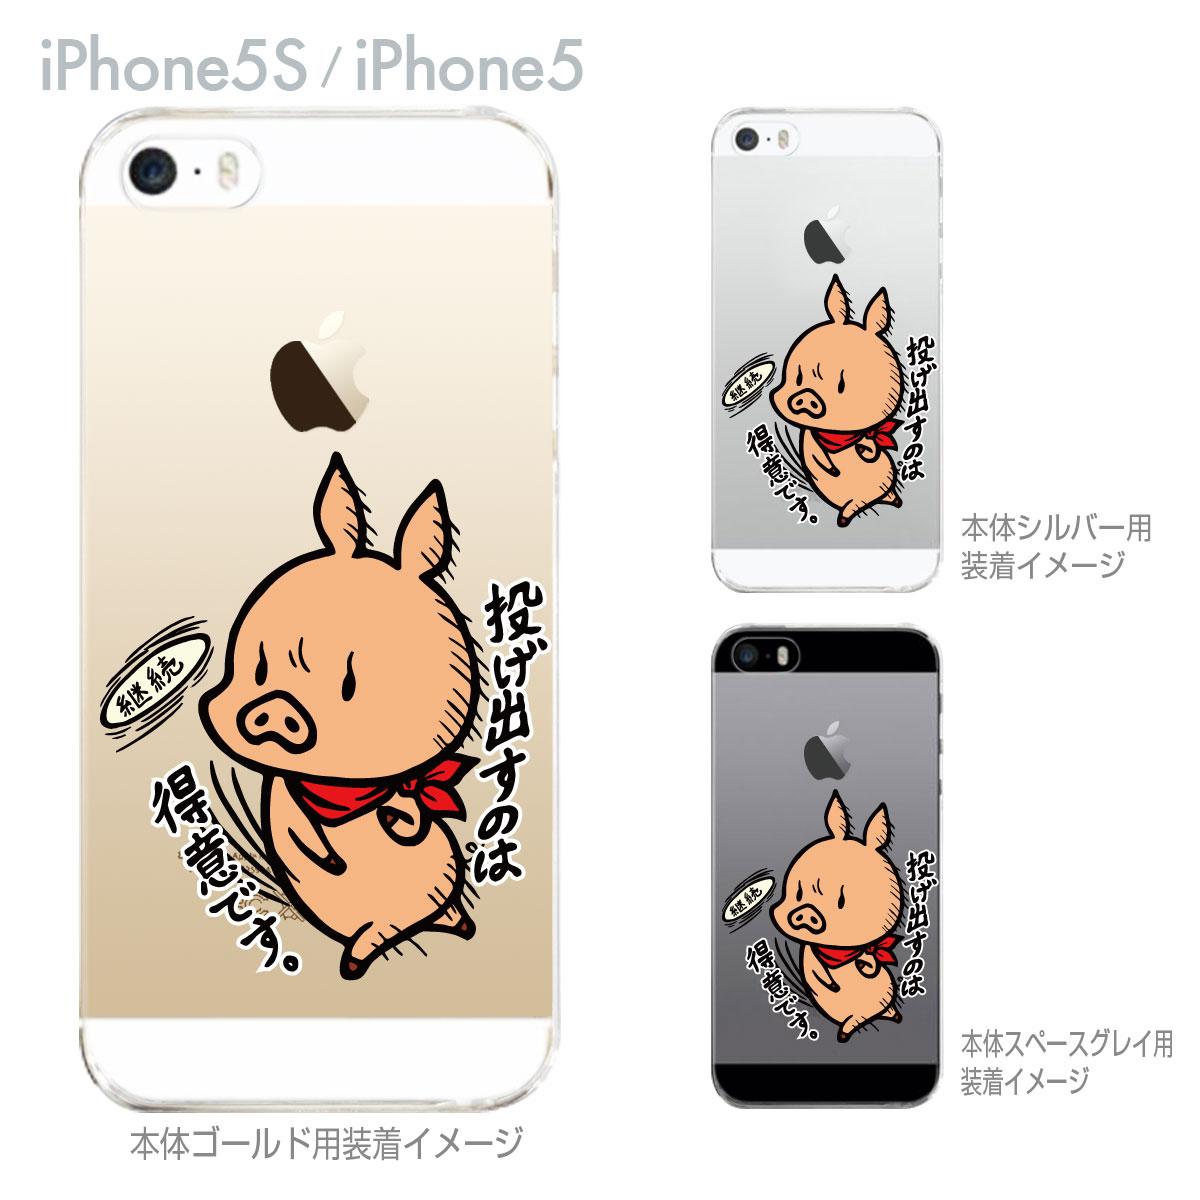 iPhone5s iPhone5 iPhone SE Clear Arts iPhone ケース カバー スマホケース クリアケース ハードケース 46-ip5s-sh2017s